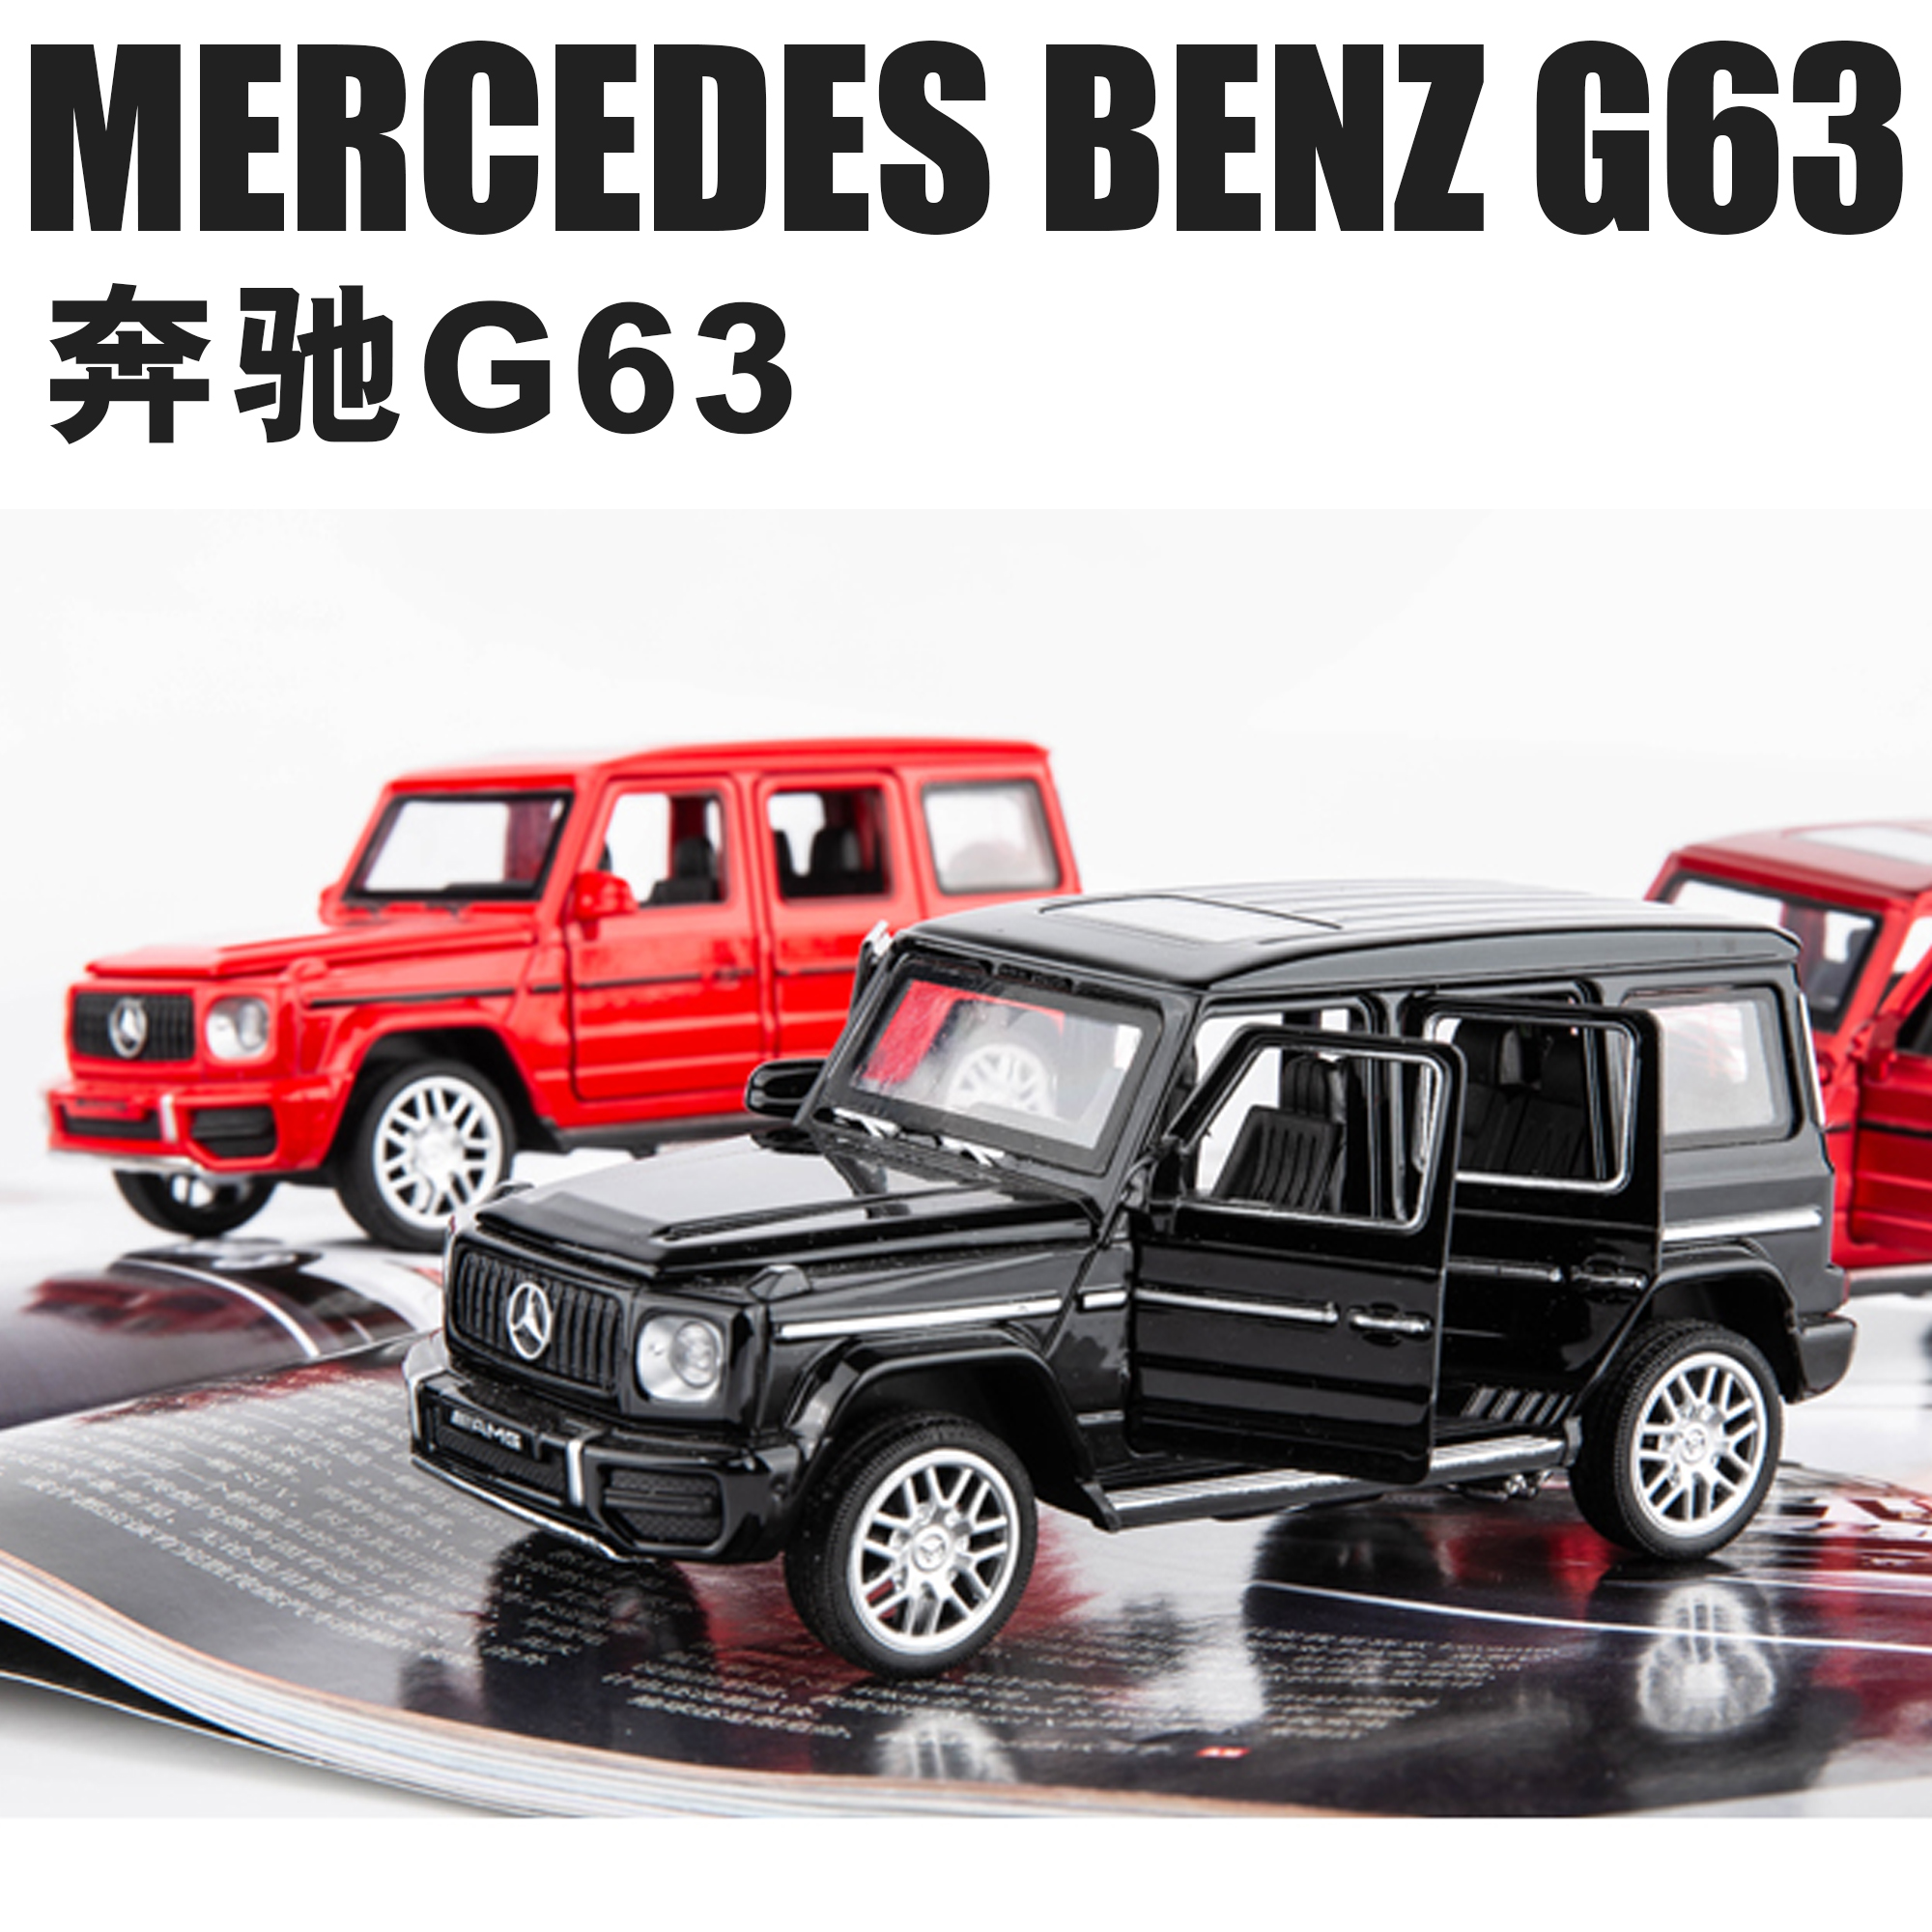 Diecast 1:32 Alloy Pull Back Model Car Model Toy Sound Light Pull Back Toy Car For G63 Toys For Boys Children Gift Car Toys